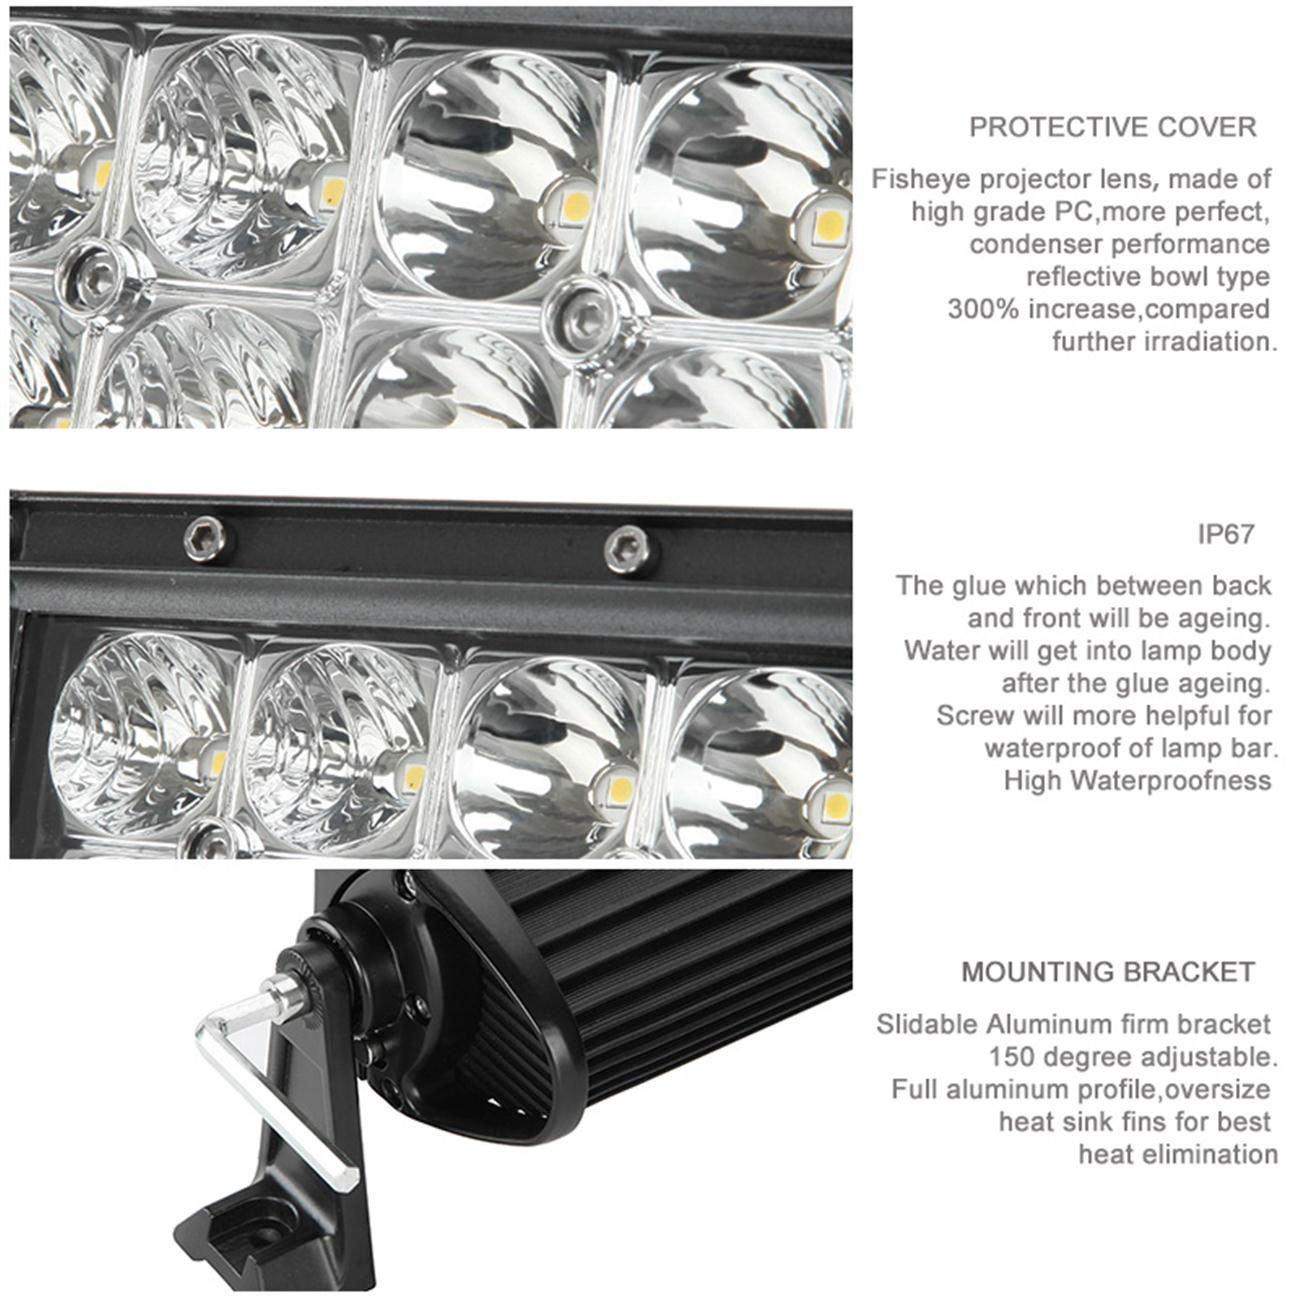 Fit Jeep Wrangler Jk 2007 2017 Offroad Light Bar Kit Powlab 52 Inch Tj Windshield Lights Wiring 6000k